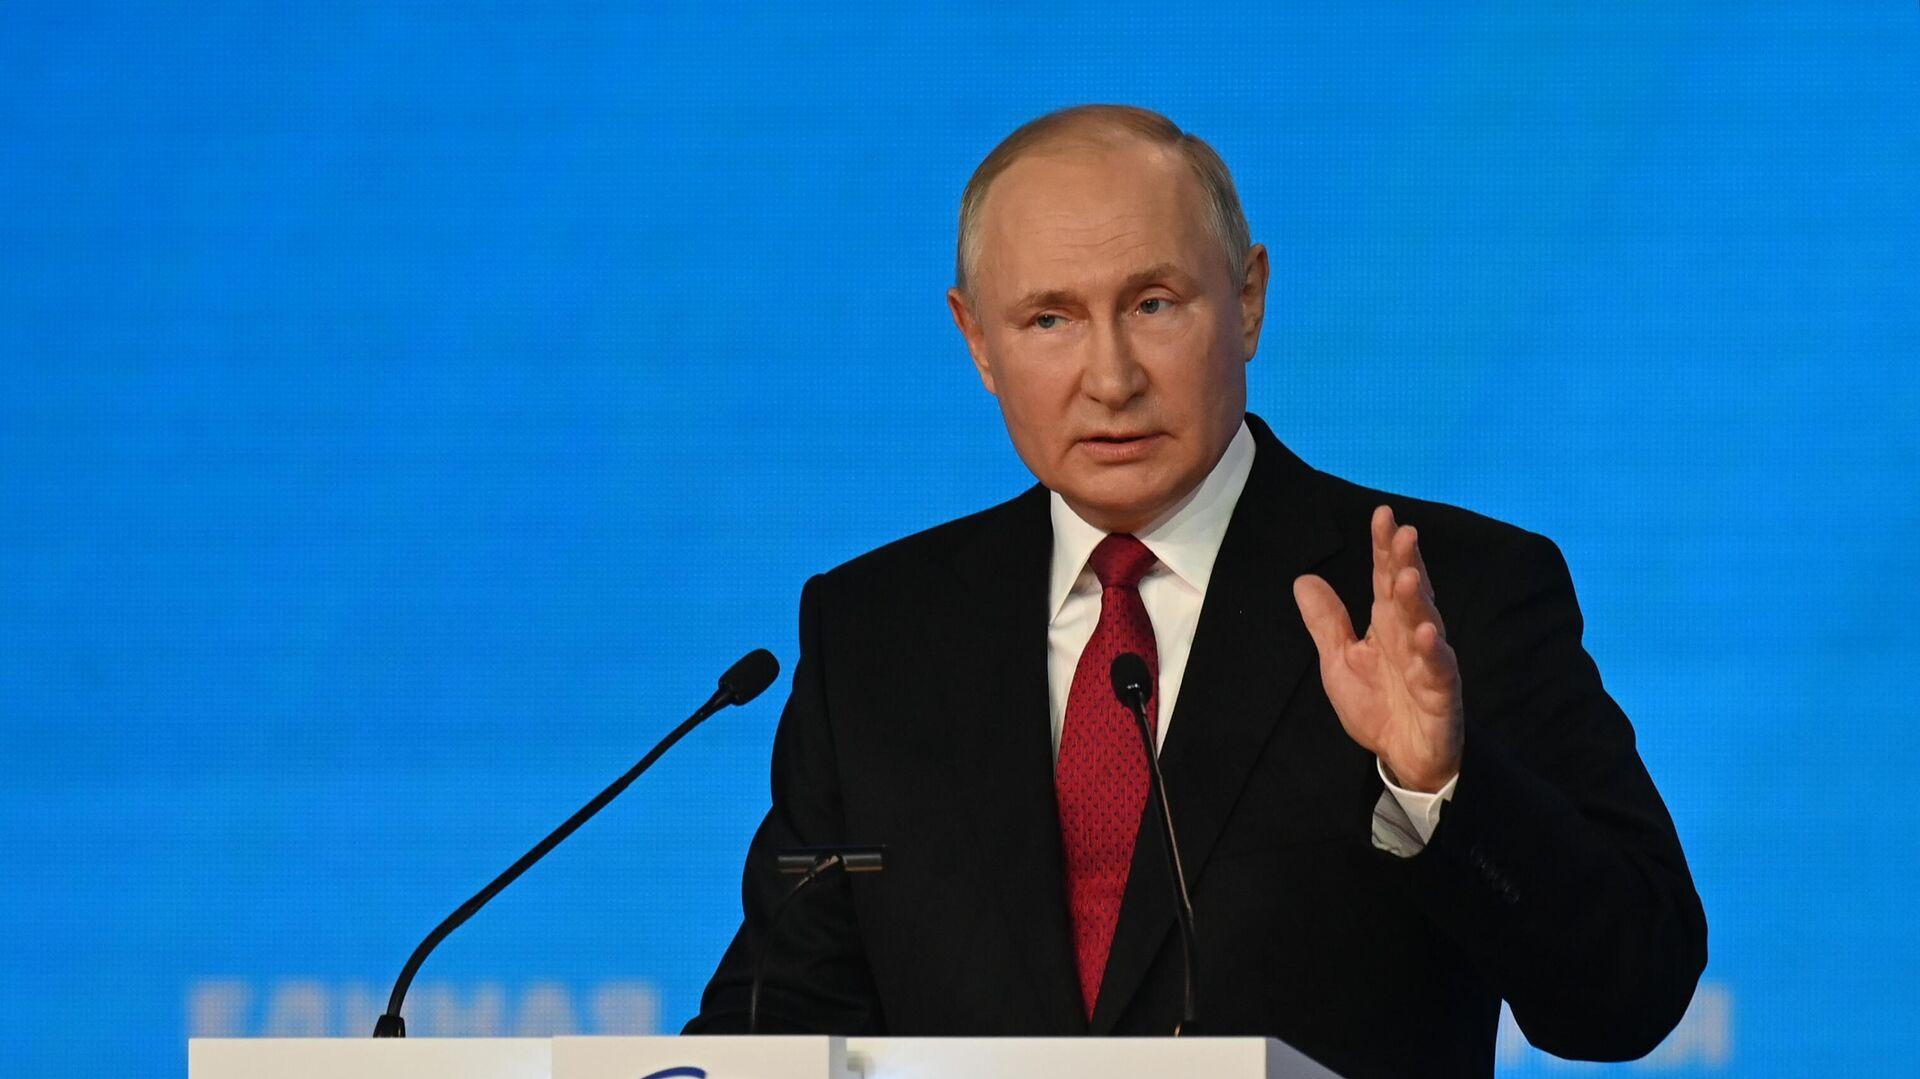 Ruski predsednik Vladimir Putin - Sputnik Srbija, 1920, 25.09.2021